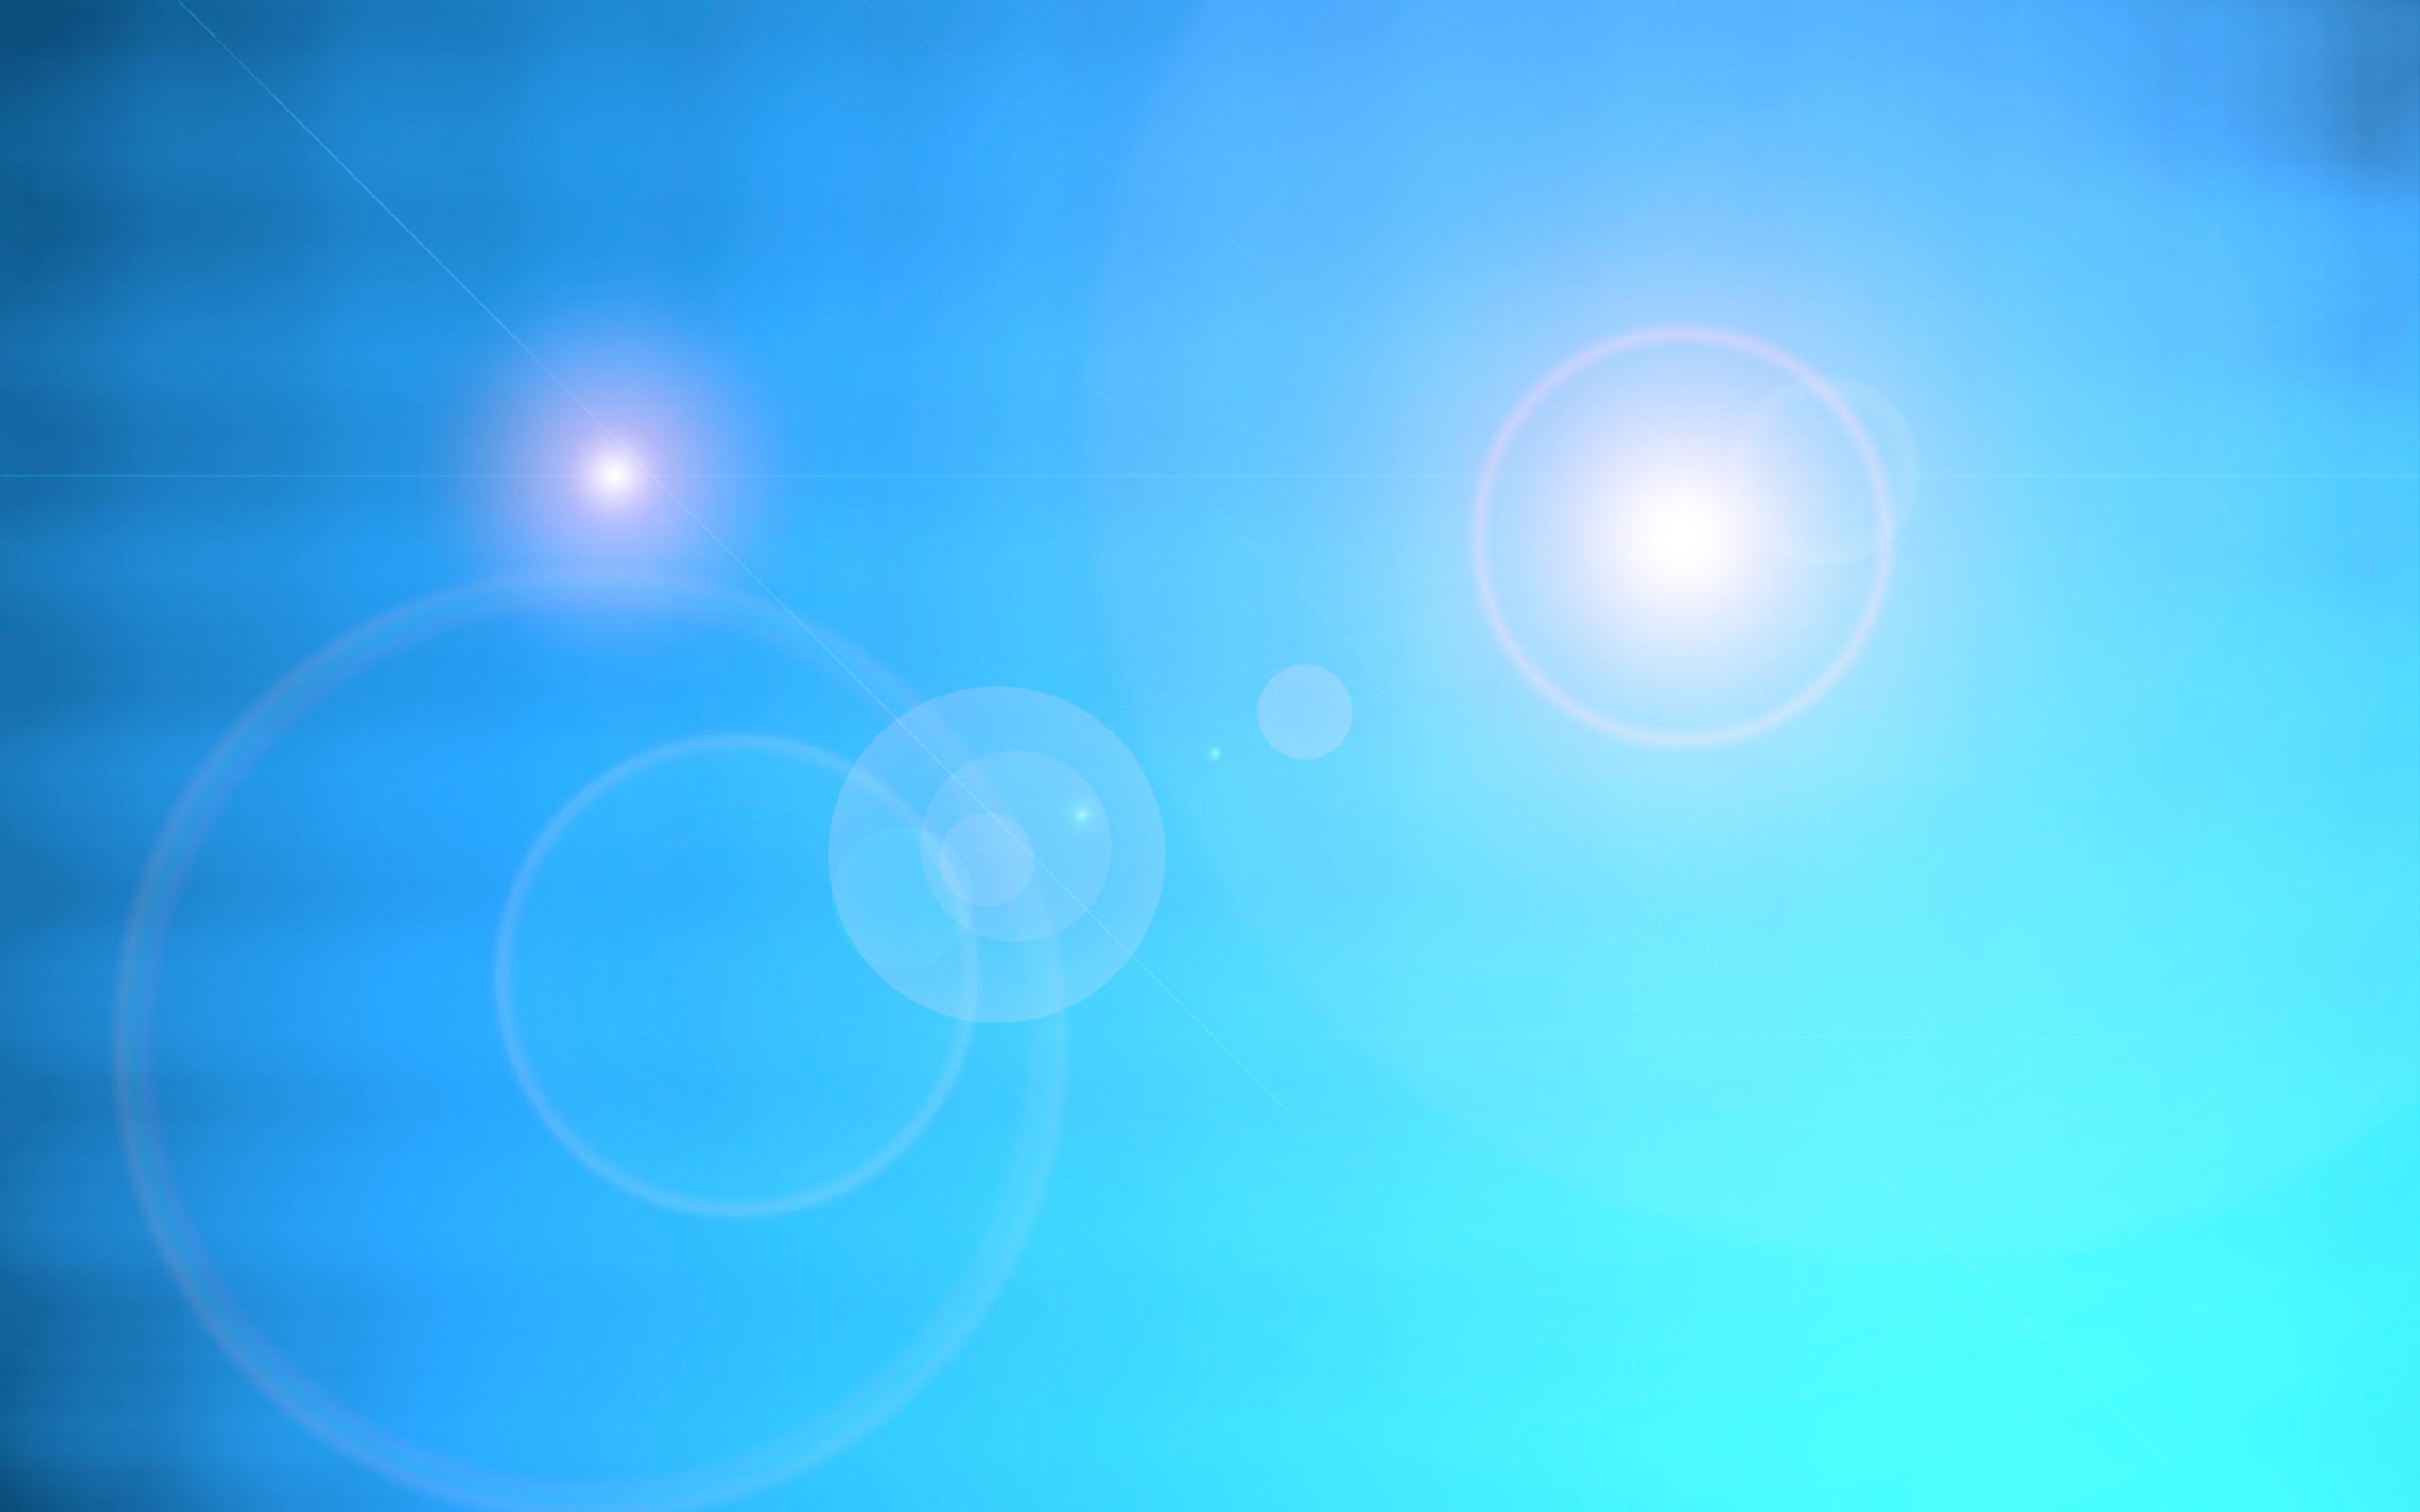 Bubble Wallpaper for My Desktop | HD Wallpapers | Pinterest | Bubbles and  Wallpaper